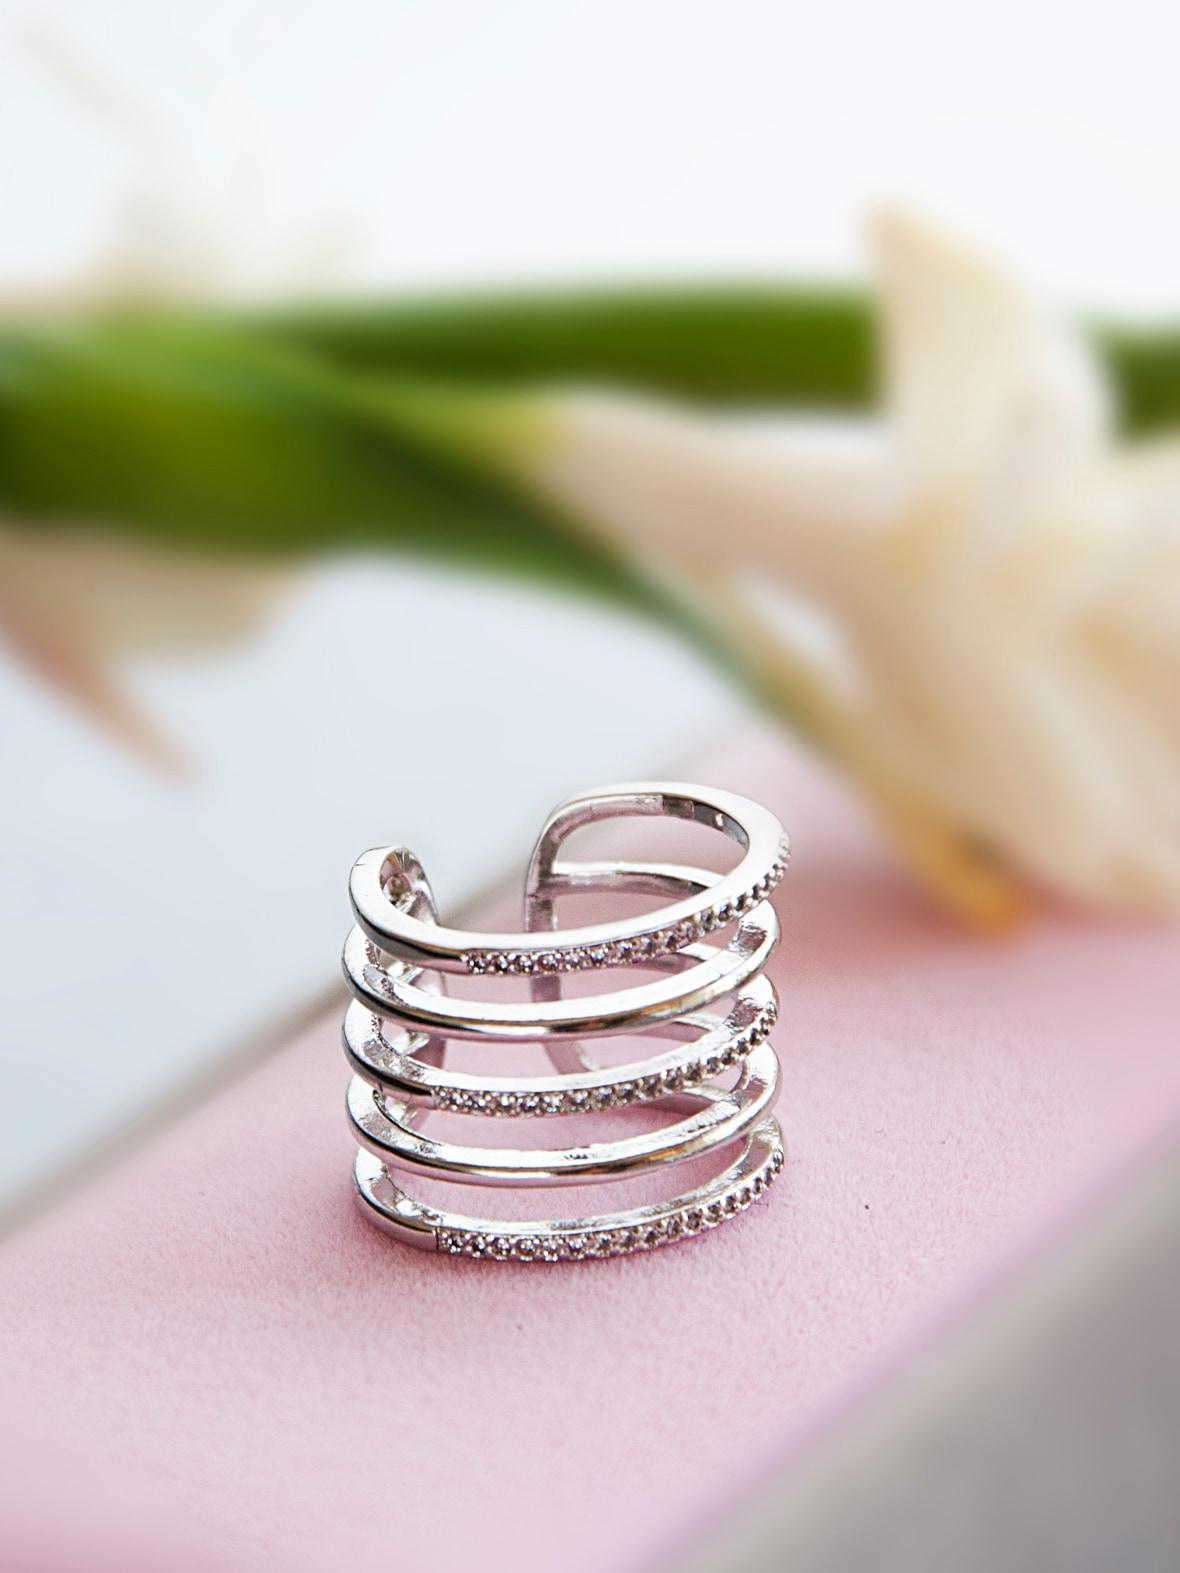 b8181423e Tanishq Diamond Rings Ring Mangalsutra Tanaami Facial Kit Kit - Buy Tanishq  Diamond Rings Ring Mangalsutra Tanaami Facial Kit Kit online in India